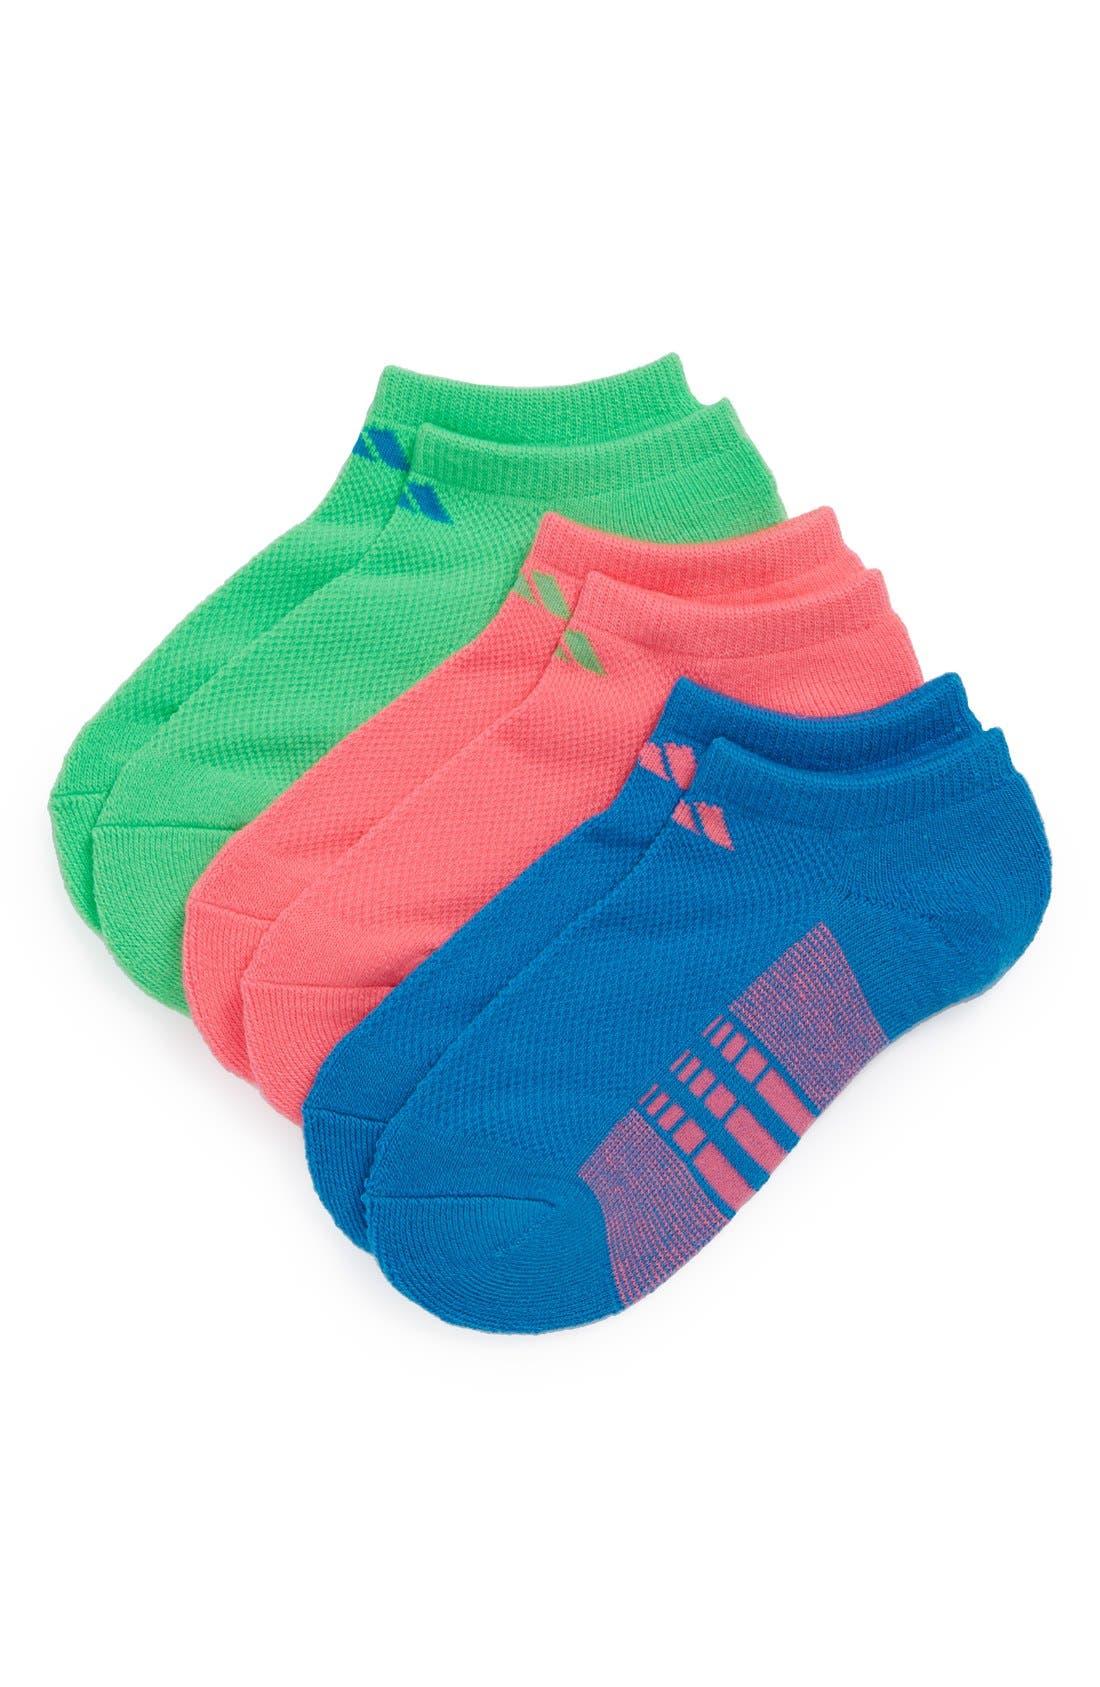 Main Image - adidas Cushioned No-Show Socks (3-Pack) (Little Kid & Big Kid)